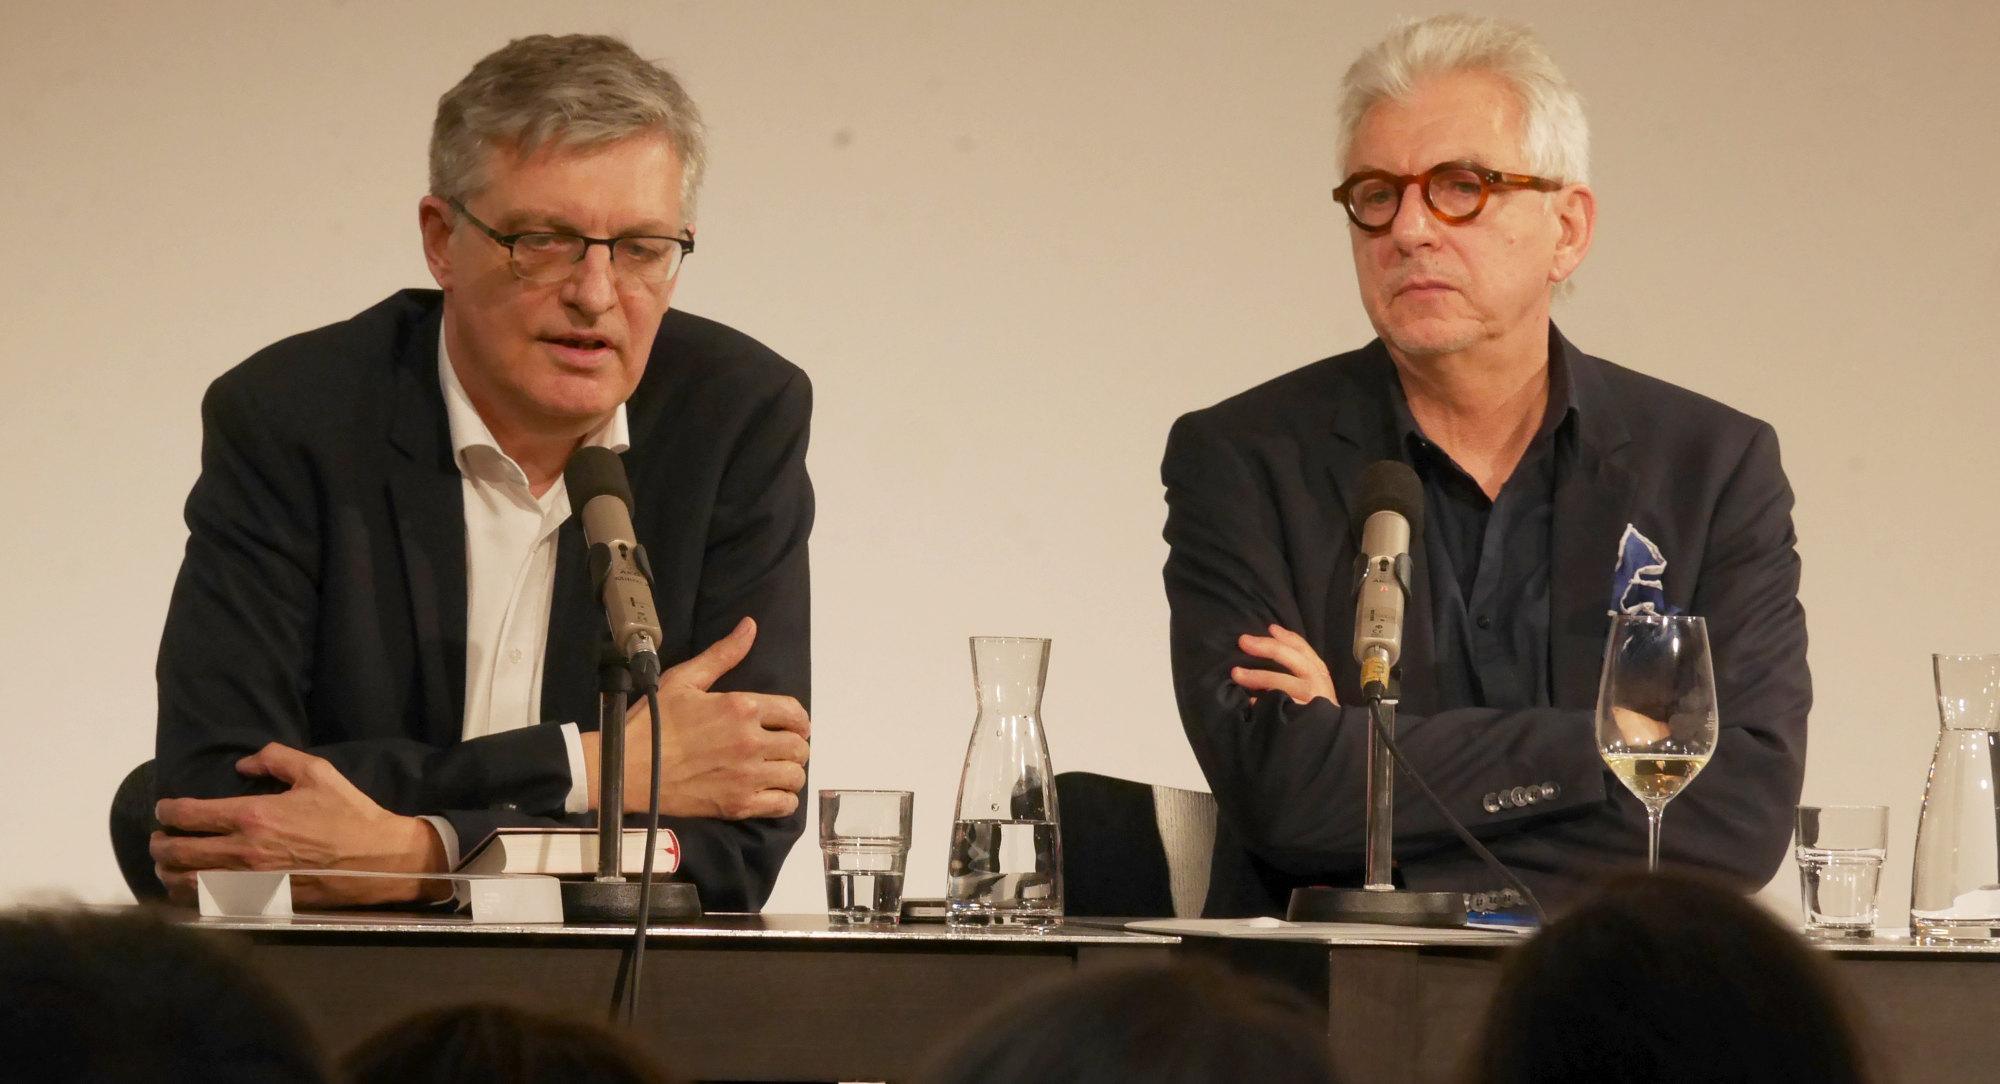 Lothar Müller, Katharina Adler: Freuds Dinge + Ida,                                                               Donnerstag, 07.03.19               /                   19.00              Uhr                               <br/>(c) Heiner Wittmann